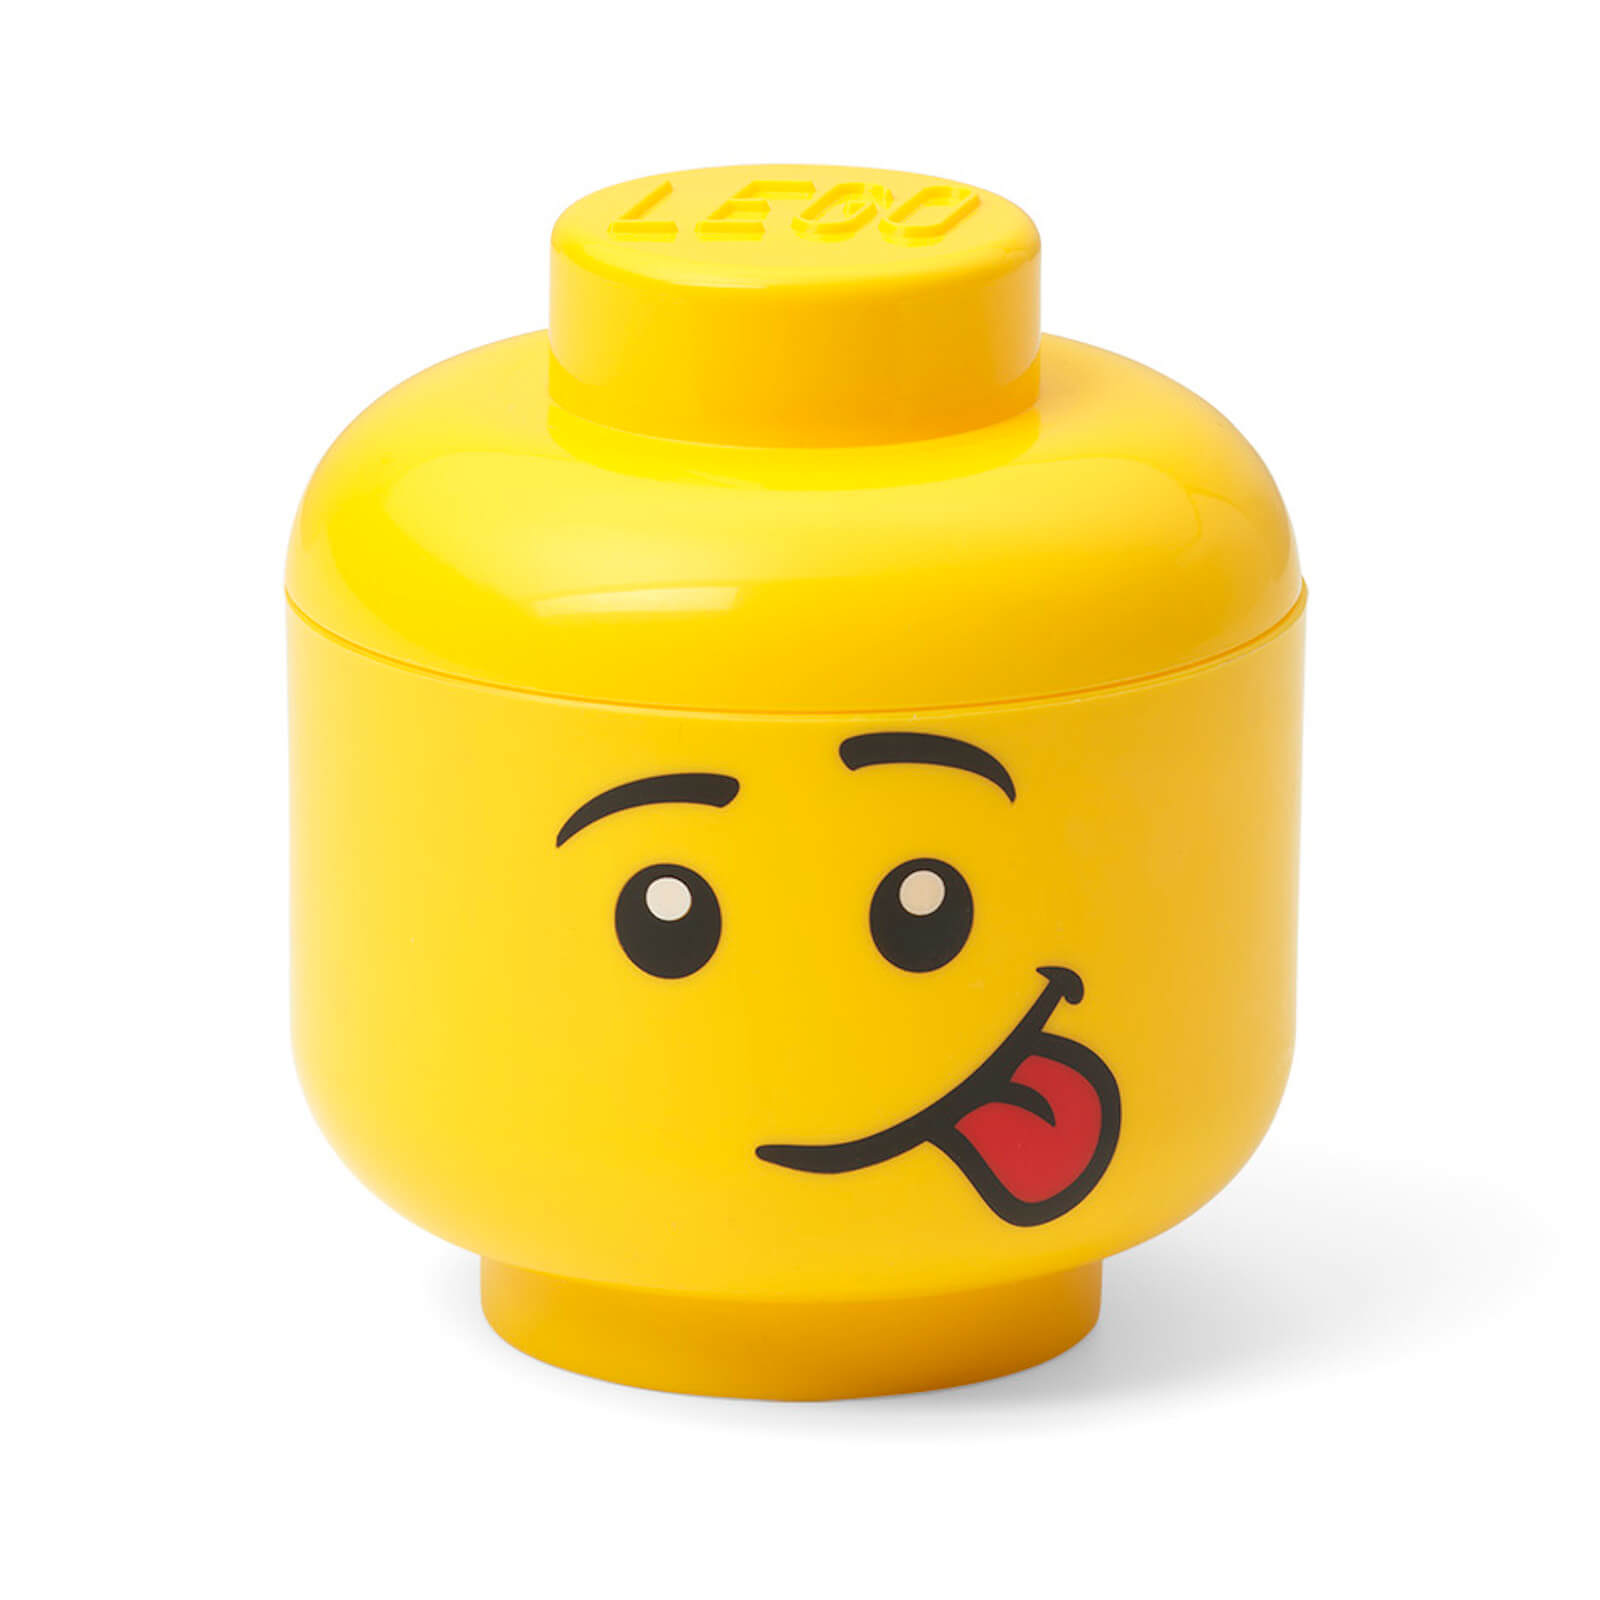 Image of LEGO Storage Mini Head - Silly